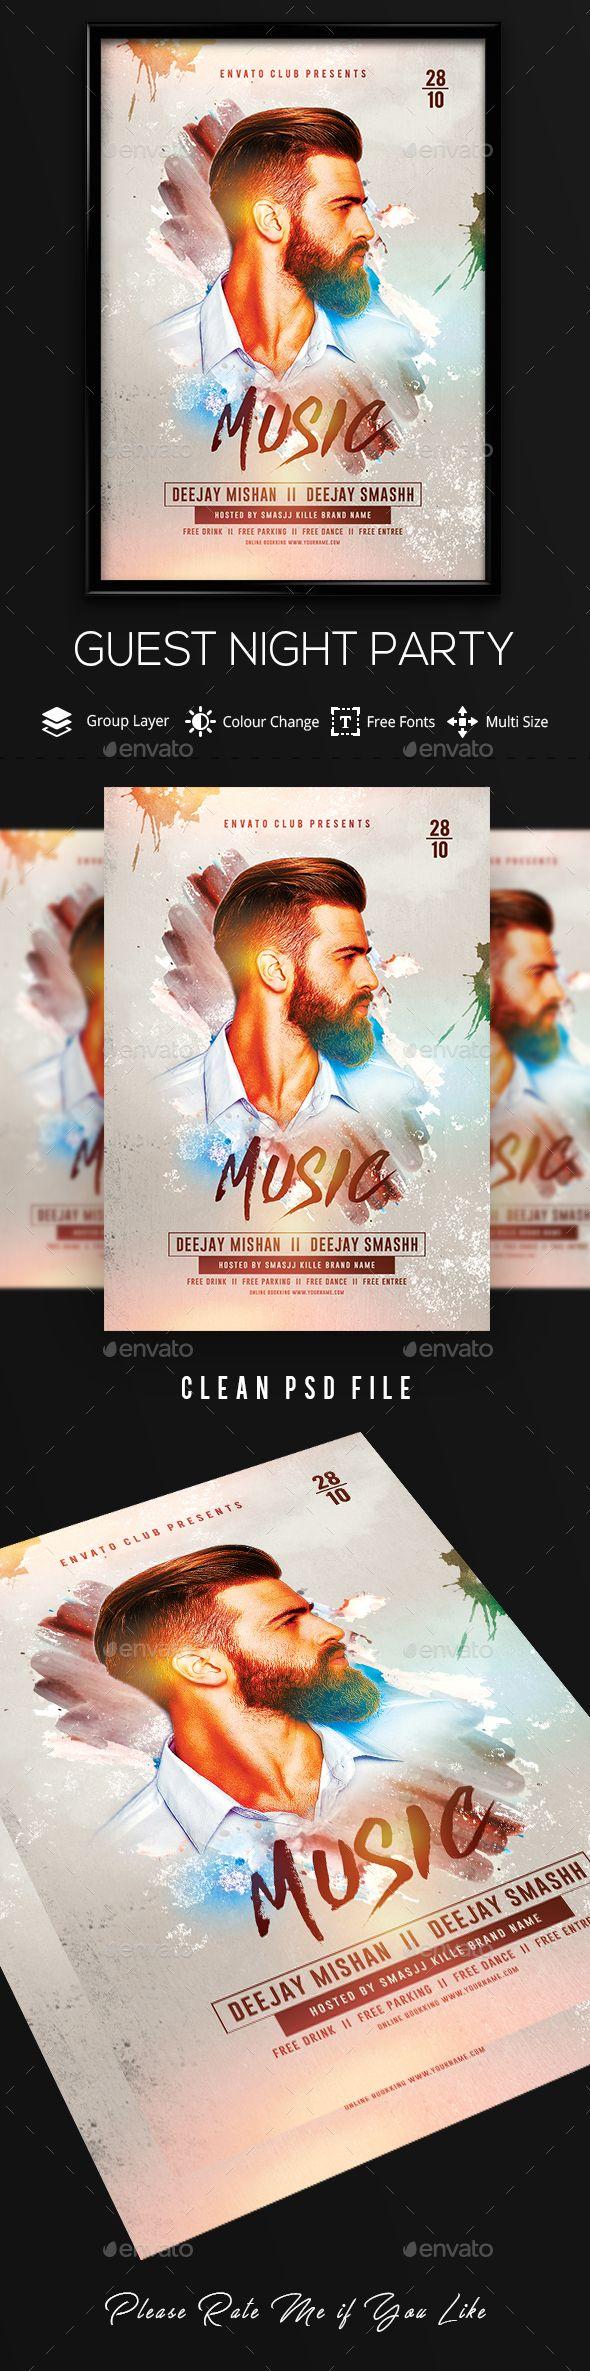 Guest Dj Artist Flyer Fully Editable Flyer Template Flyer